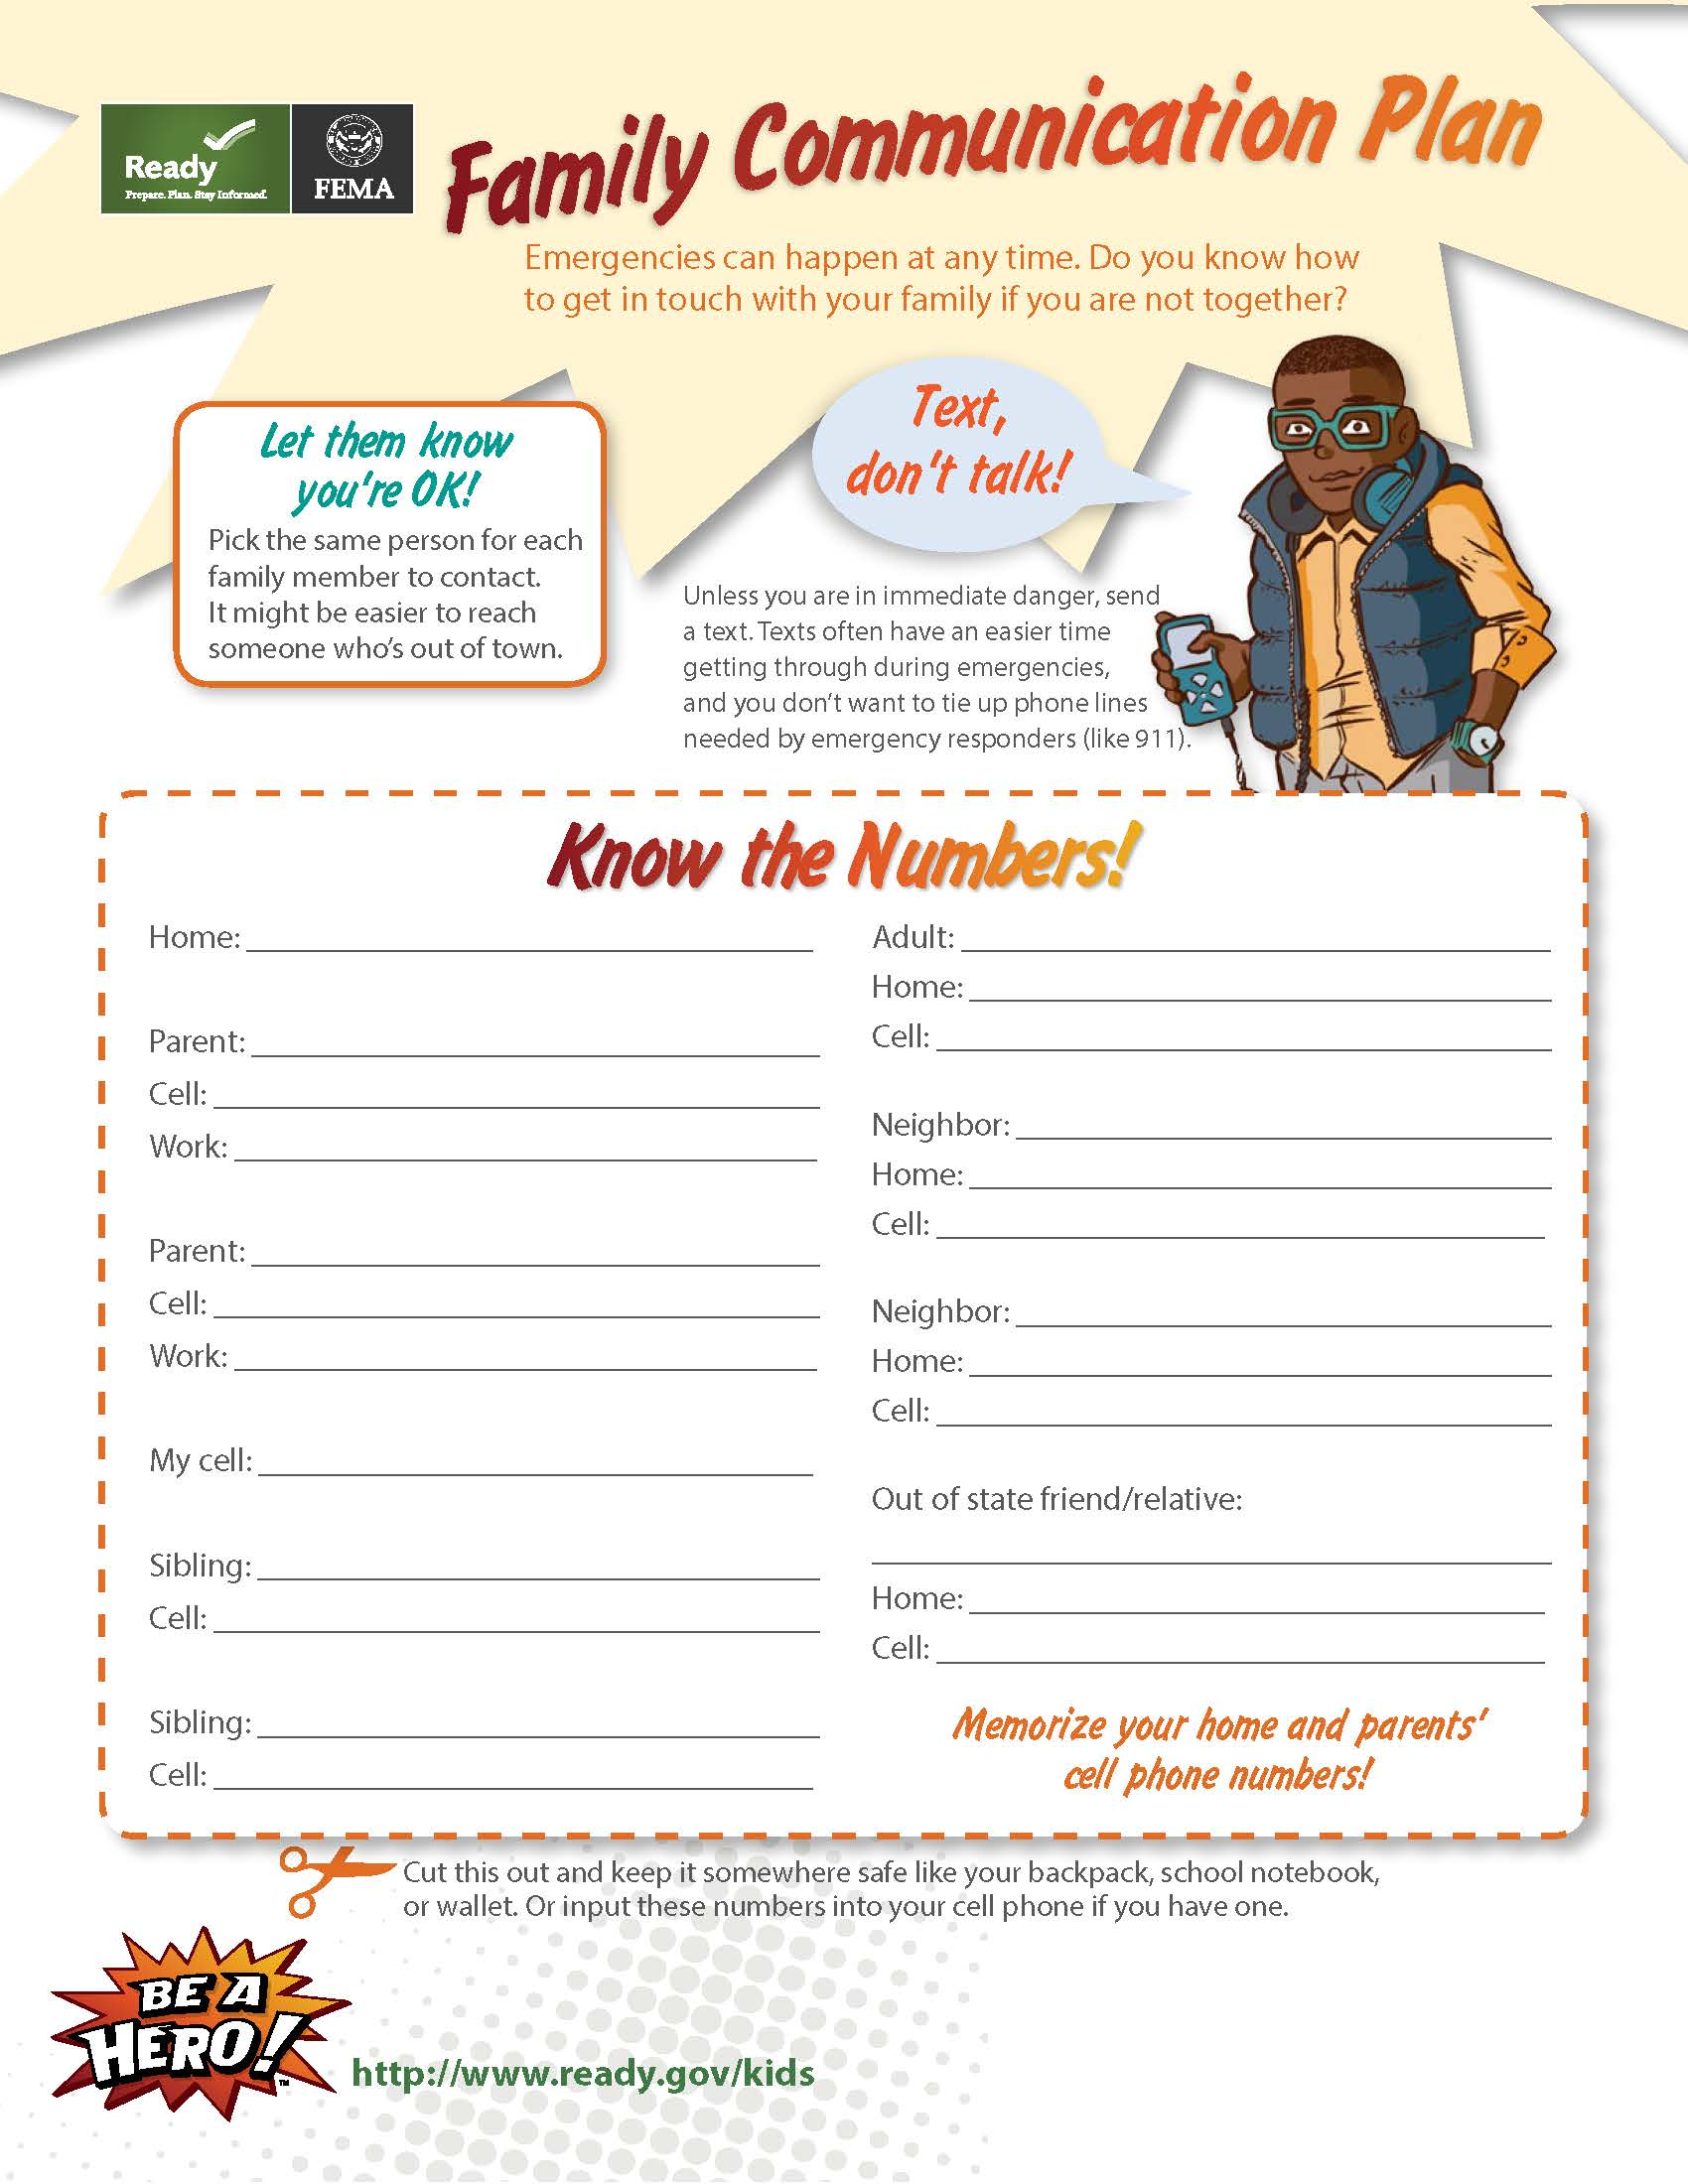 Printable worksheet for Kids